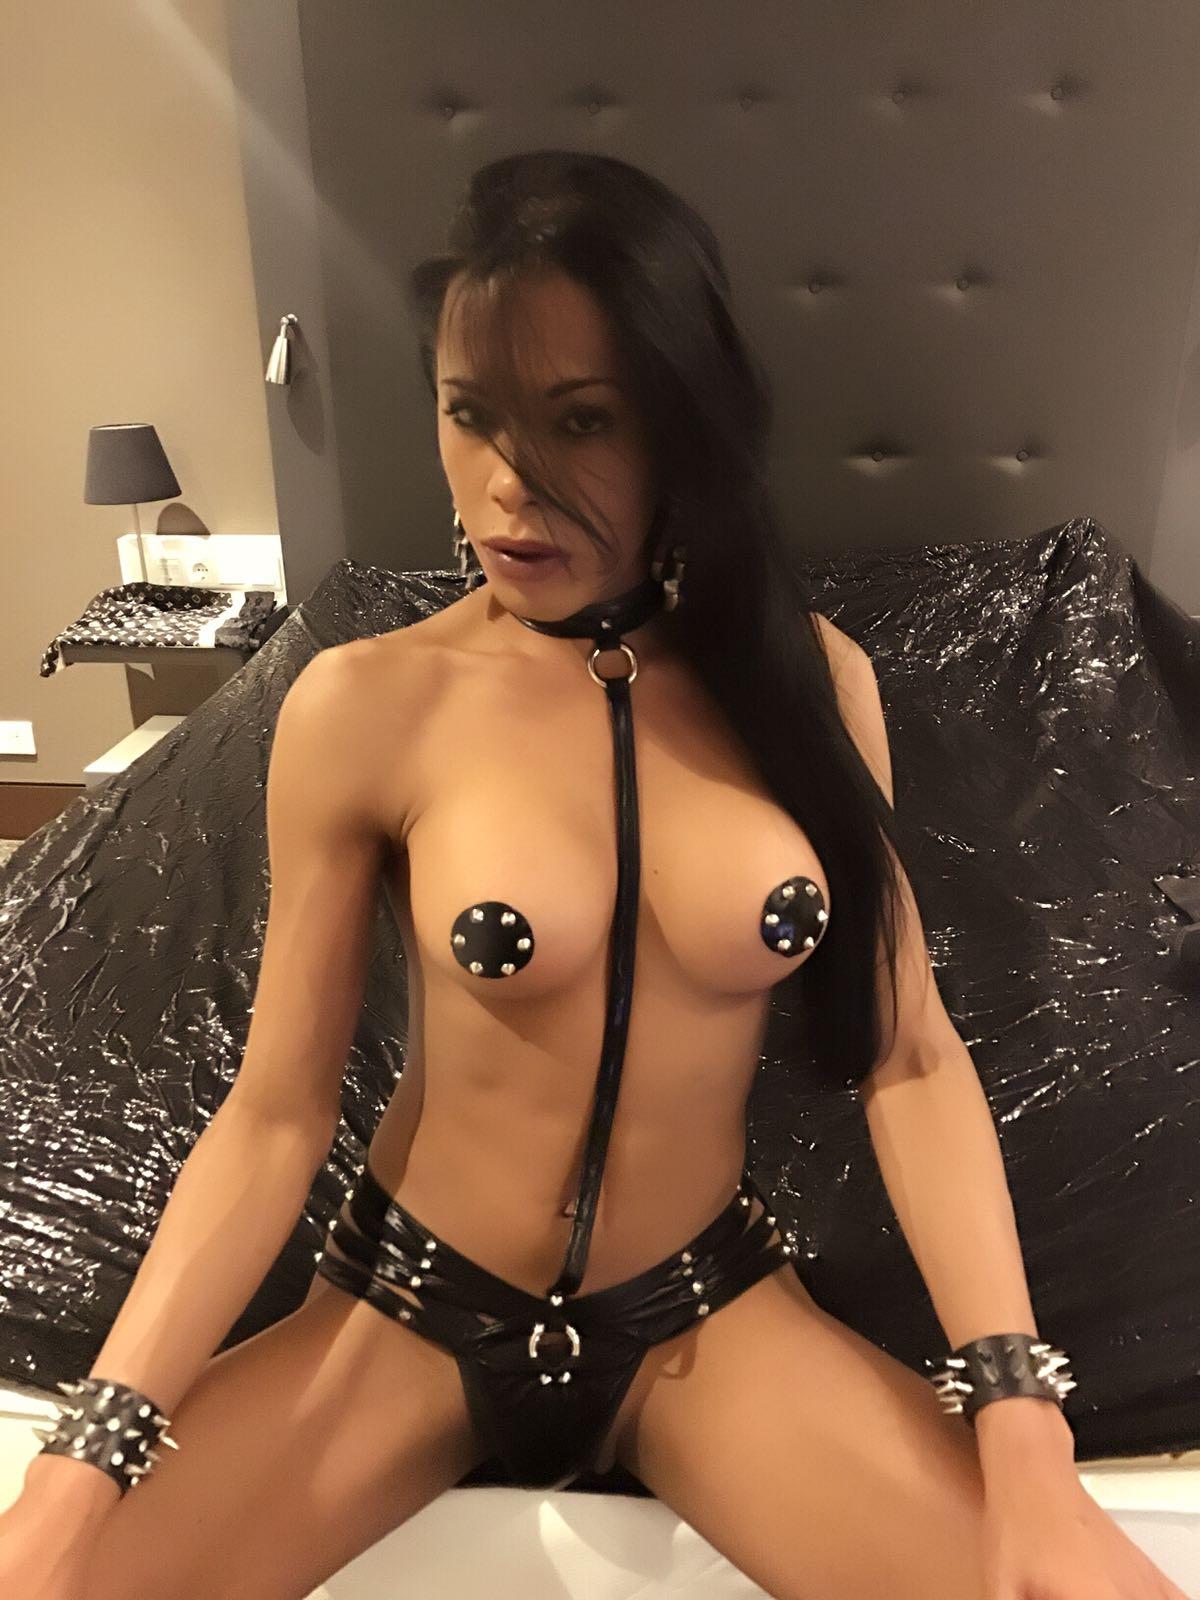 Mistress Bruna